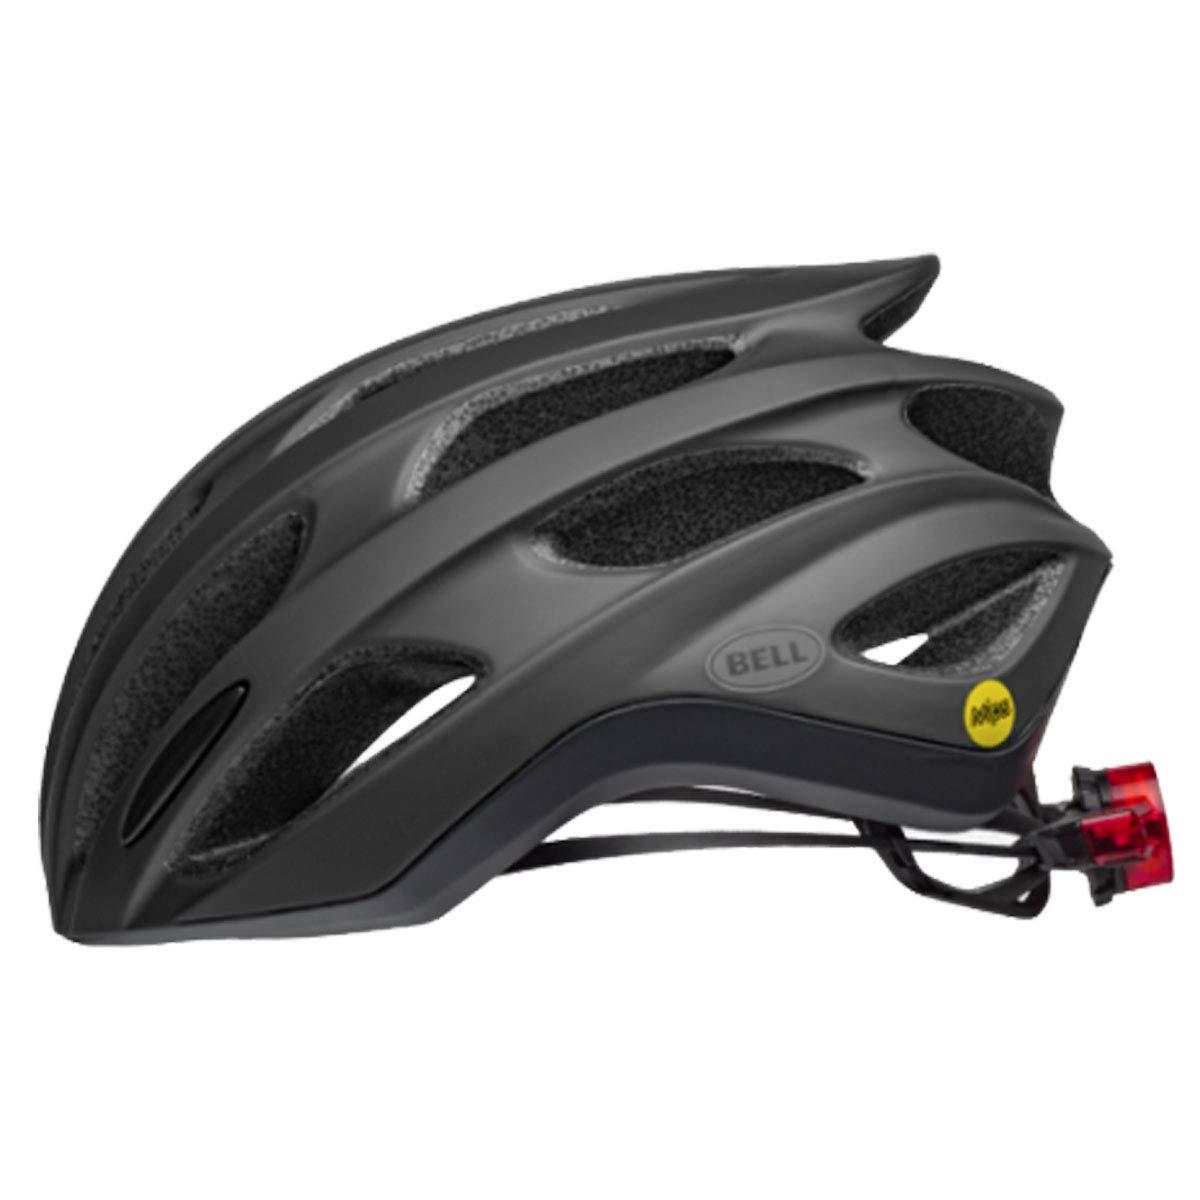 Bell Formula LED MIPS Cycling Helmet - Matte Black Small